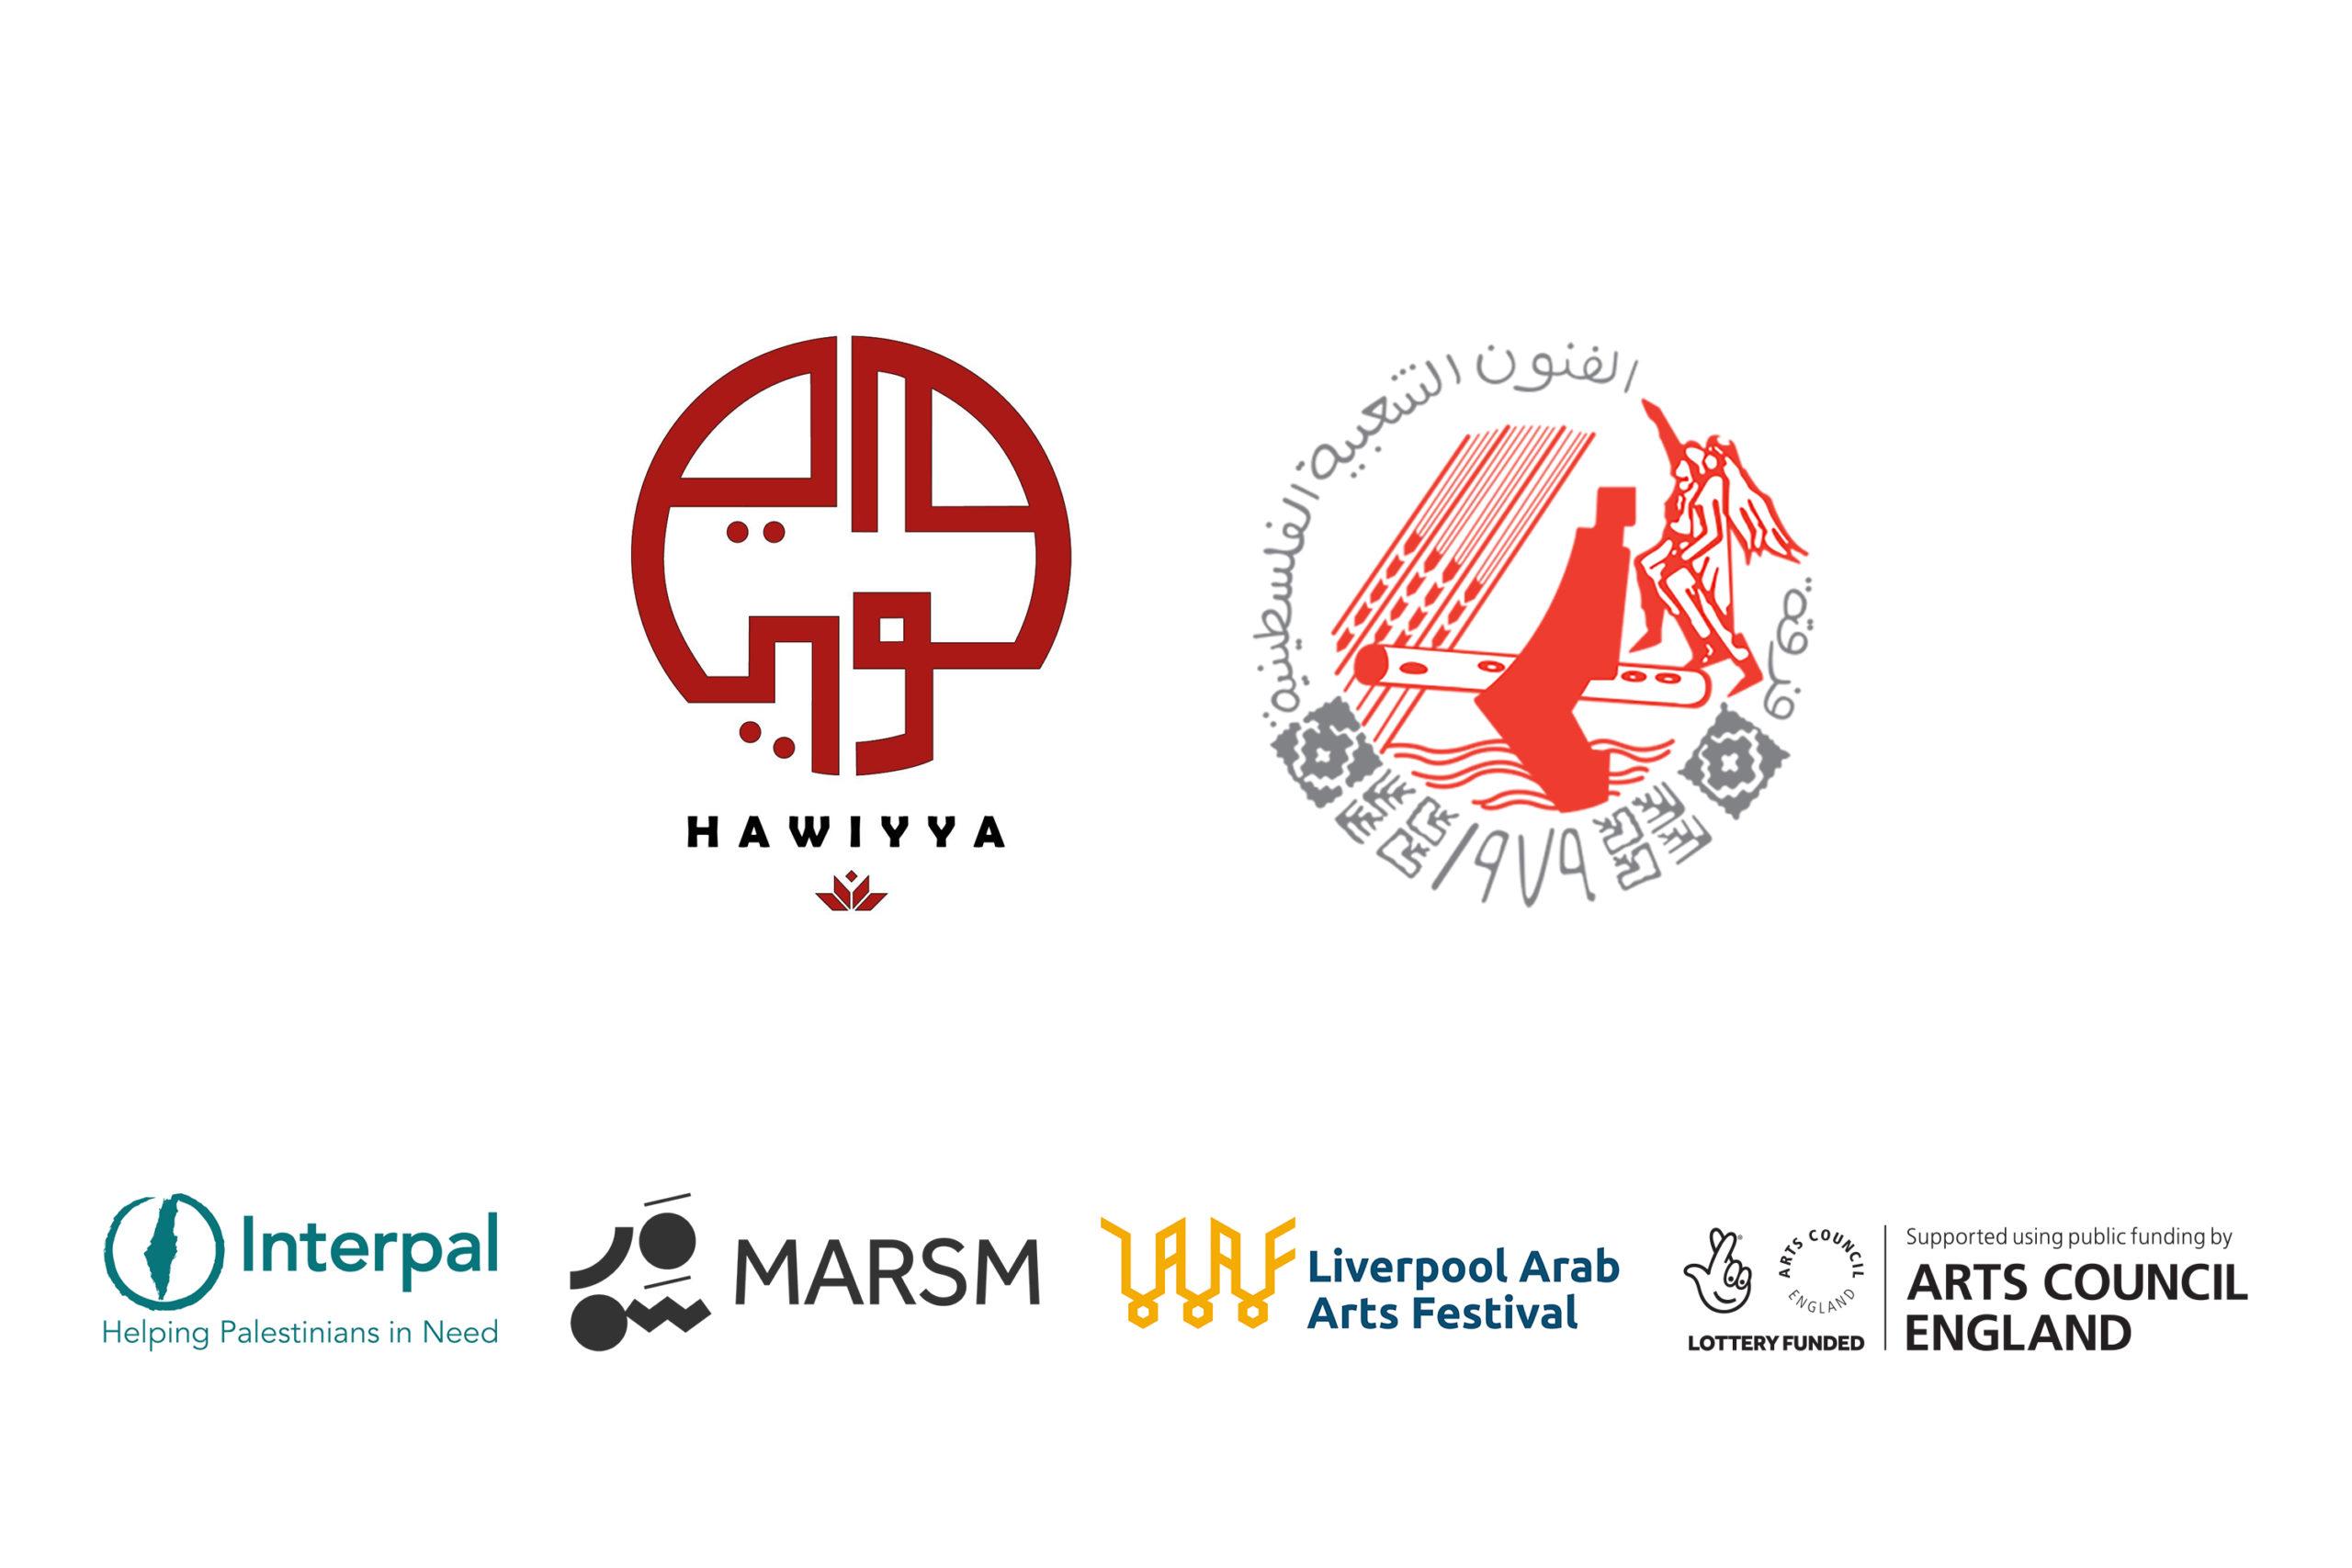 Curfew logos